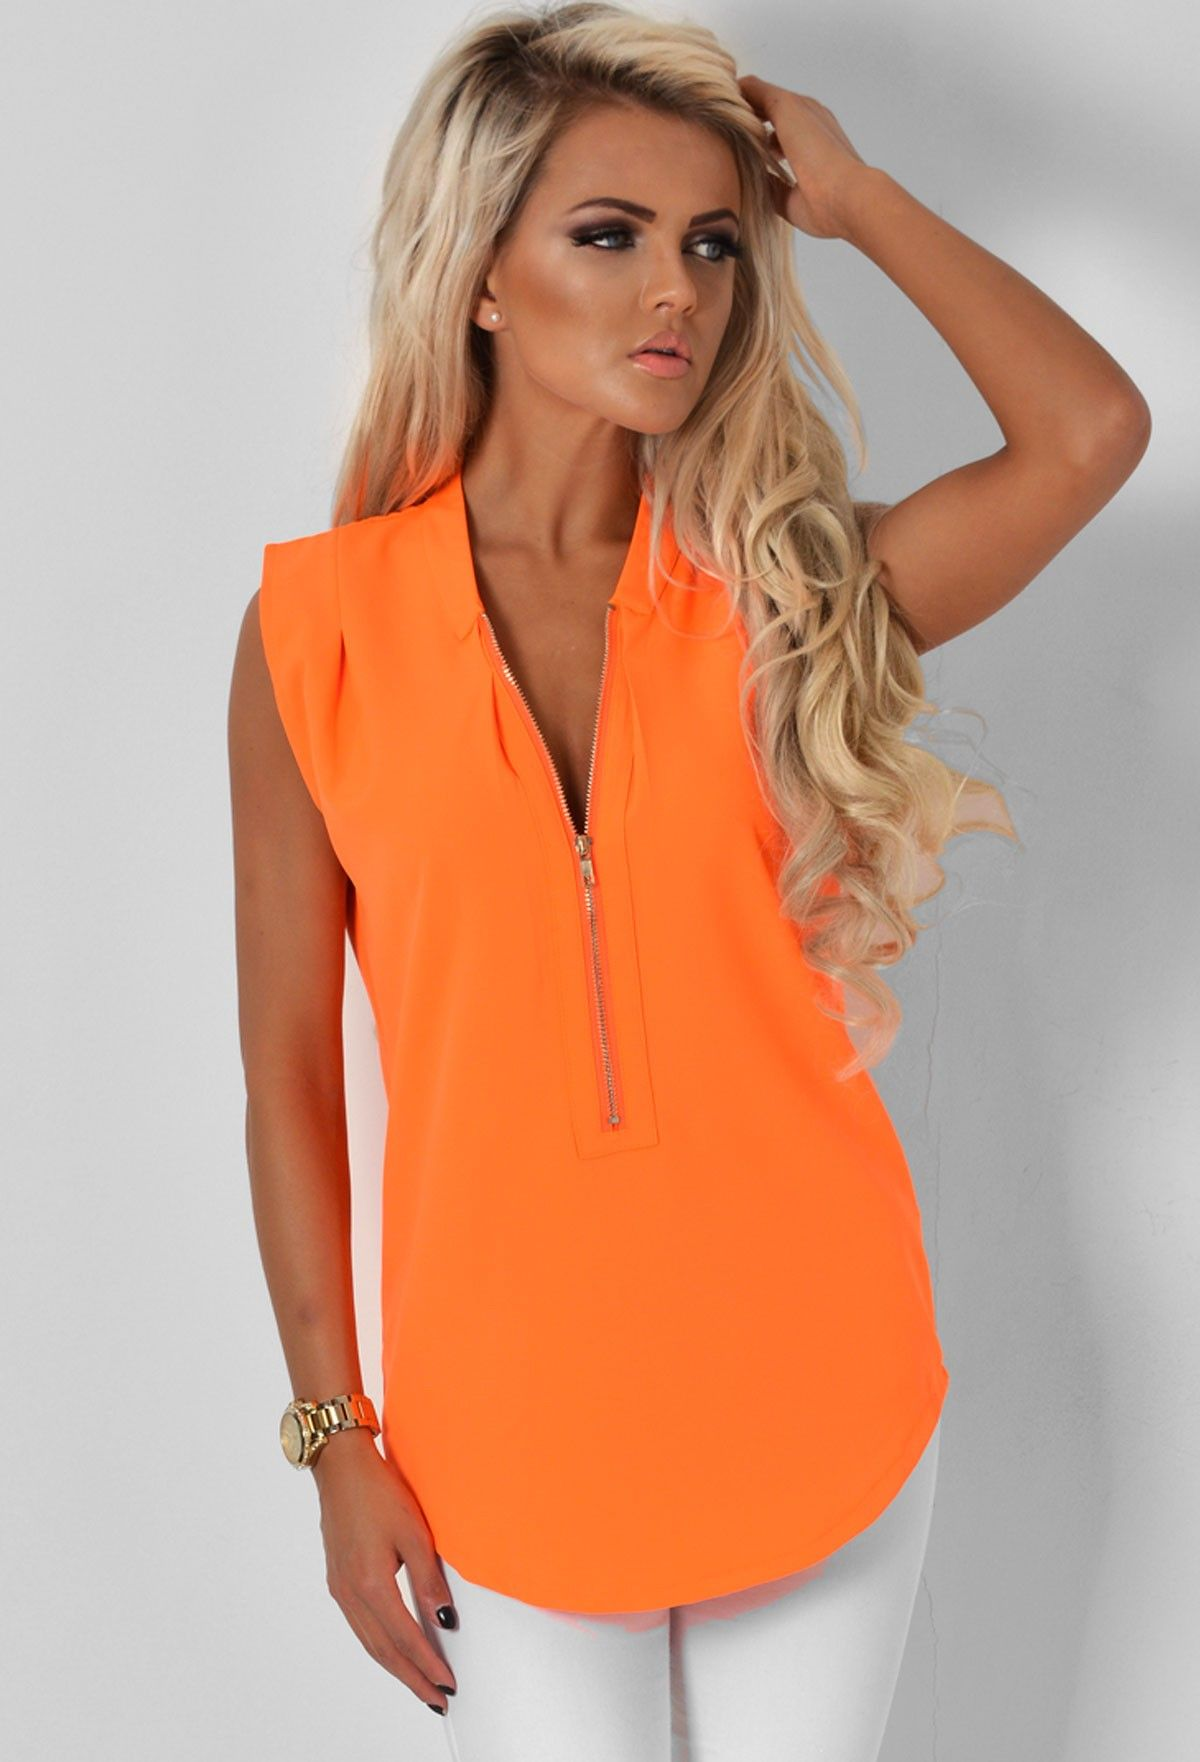 Kavita neon orange 3 4 zip top pink boutique kl der pinterest neon boutique and zip - Boutique orange narbonne ...